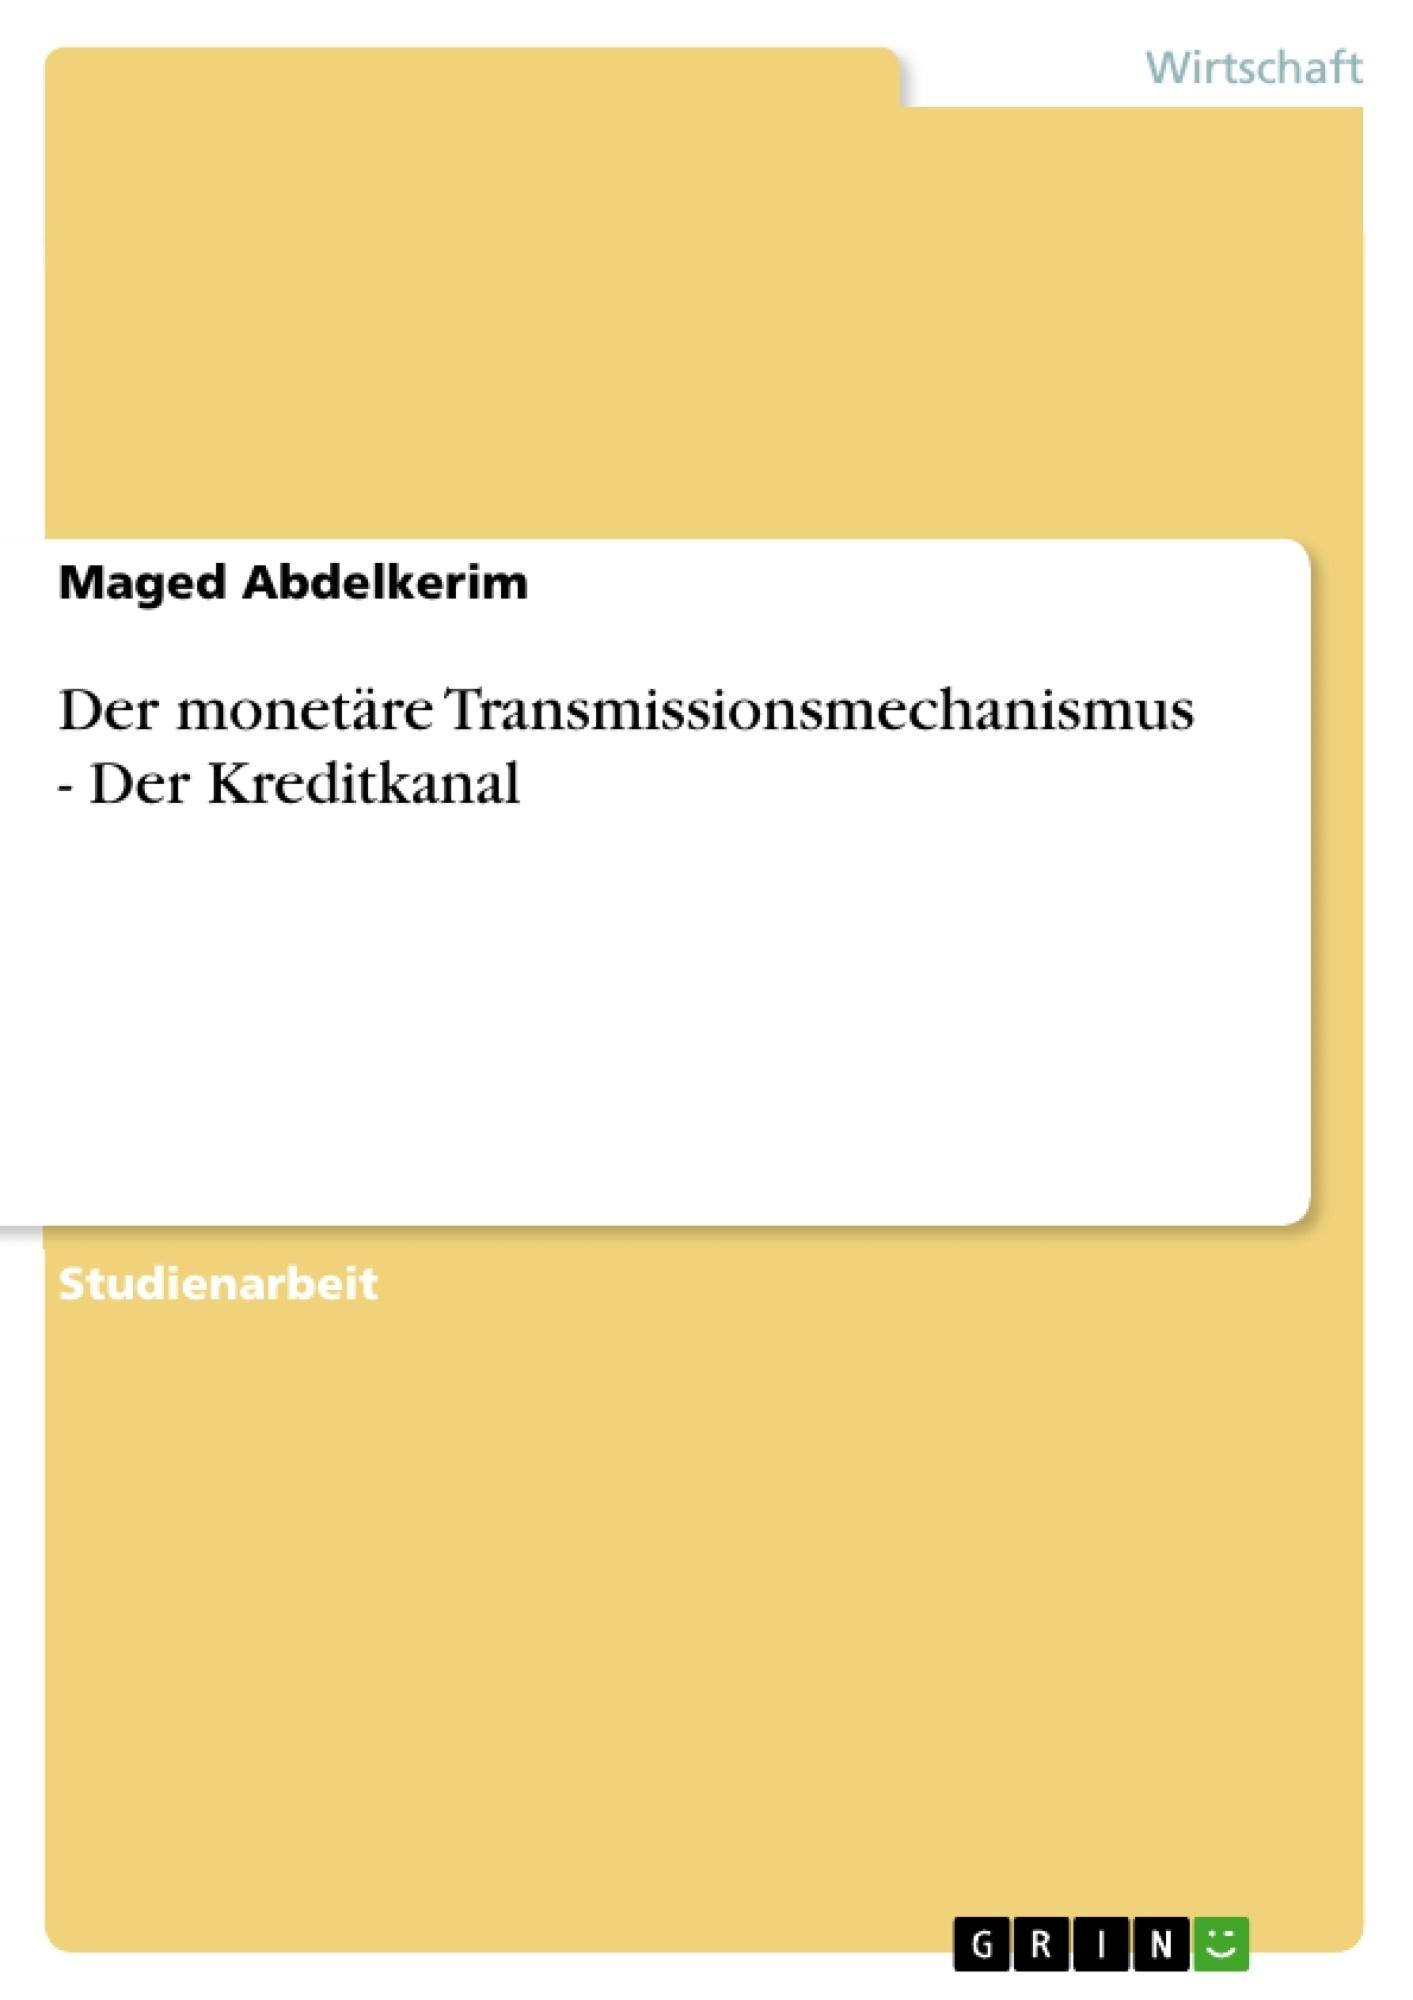 Titel: Der monetäre Transmissionsmechanismus - Der Kreditkanal